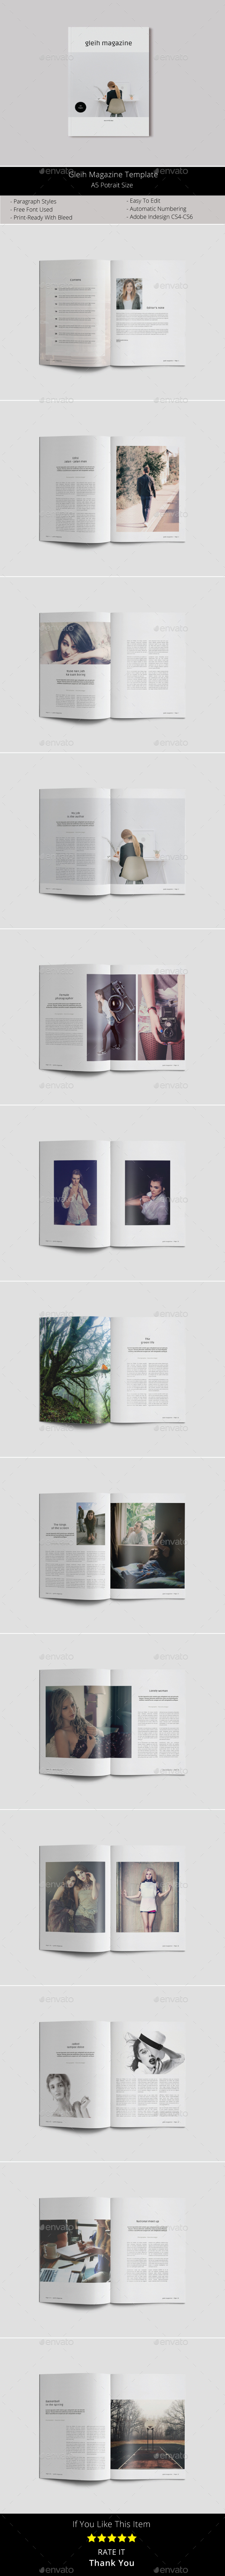 A5 Gleih Magazine - Magazines Print Templates